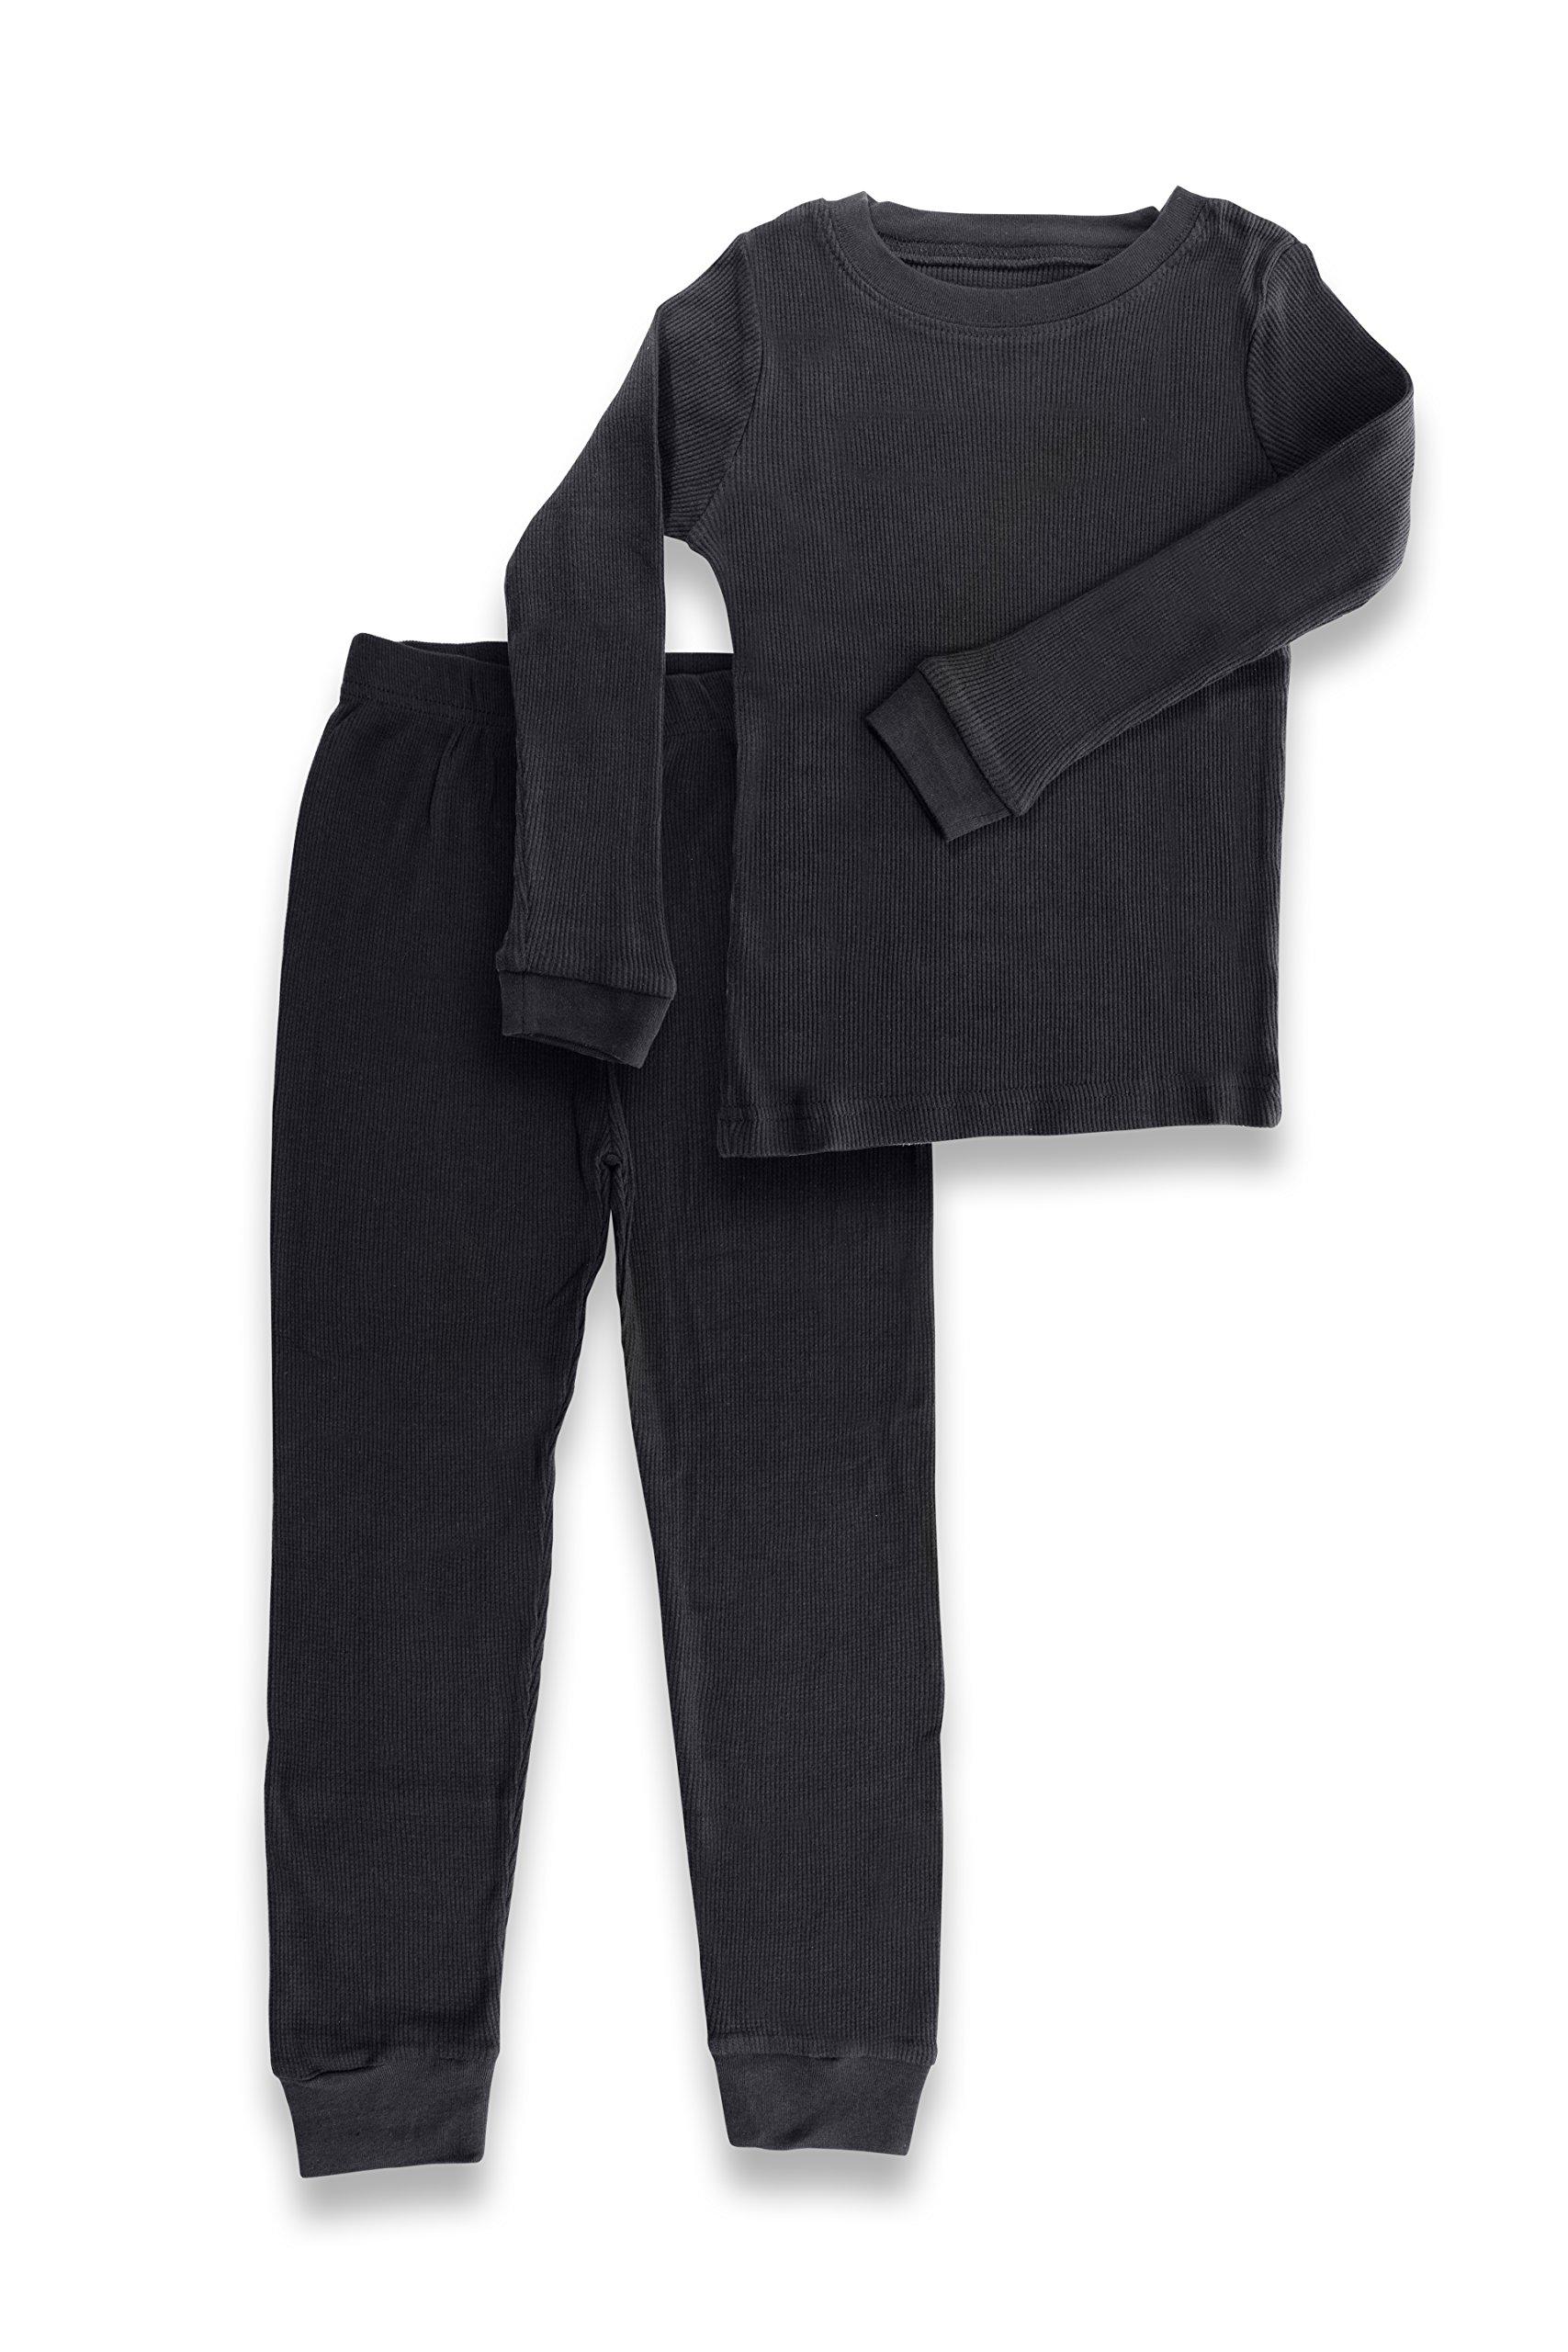 Artic Pole Boys Thermal Underwear Set 5/6 Black